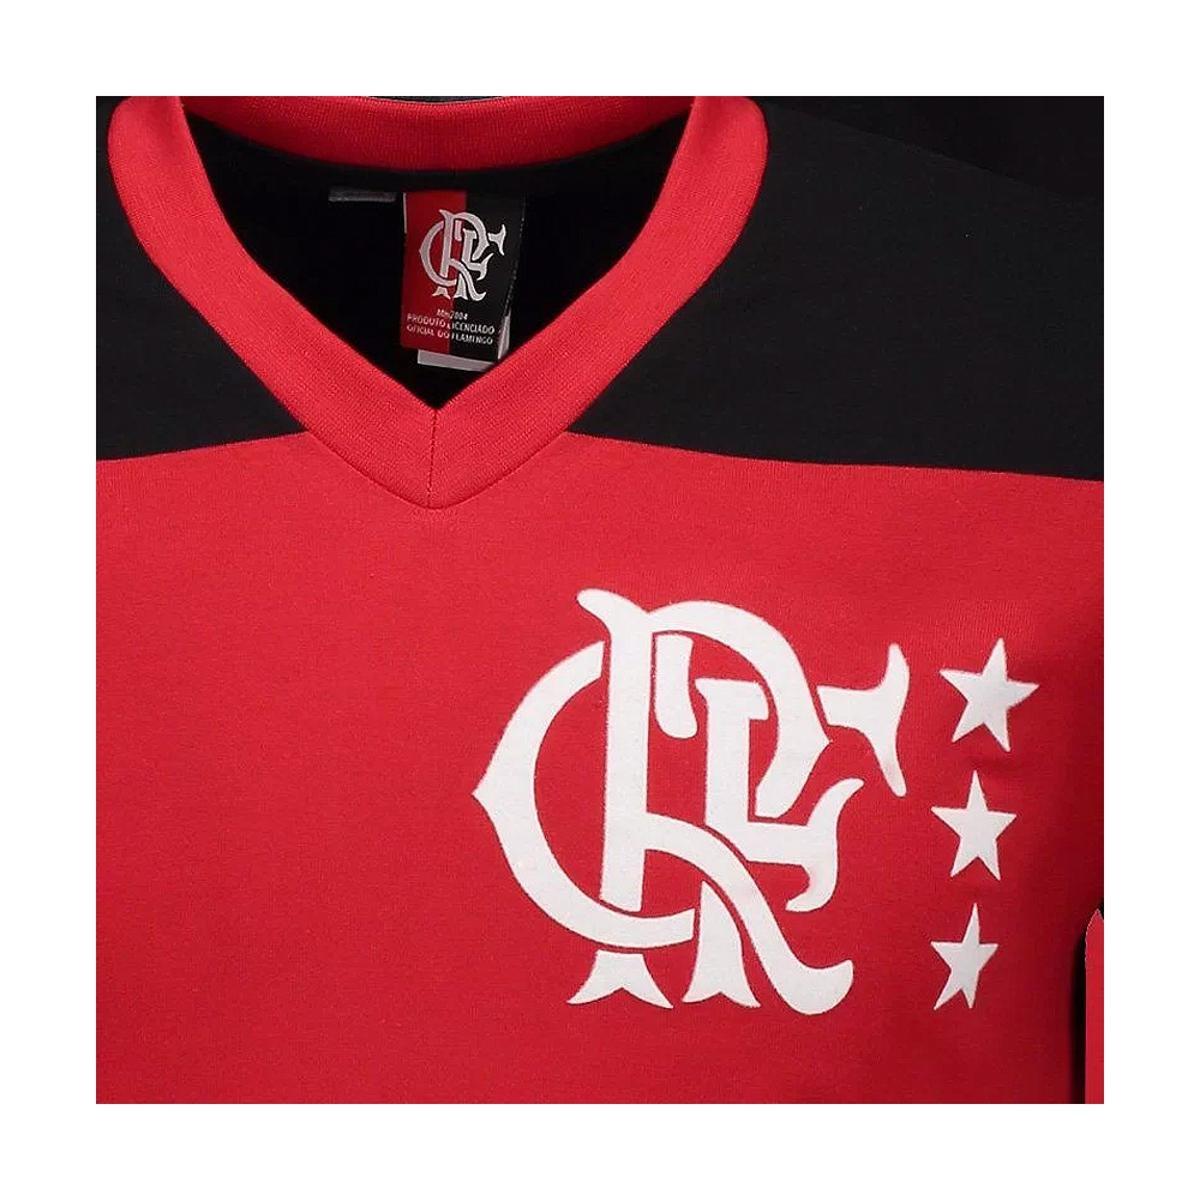 Camisa Retrô Braziline Libertadores 81 Flamengo